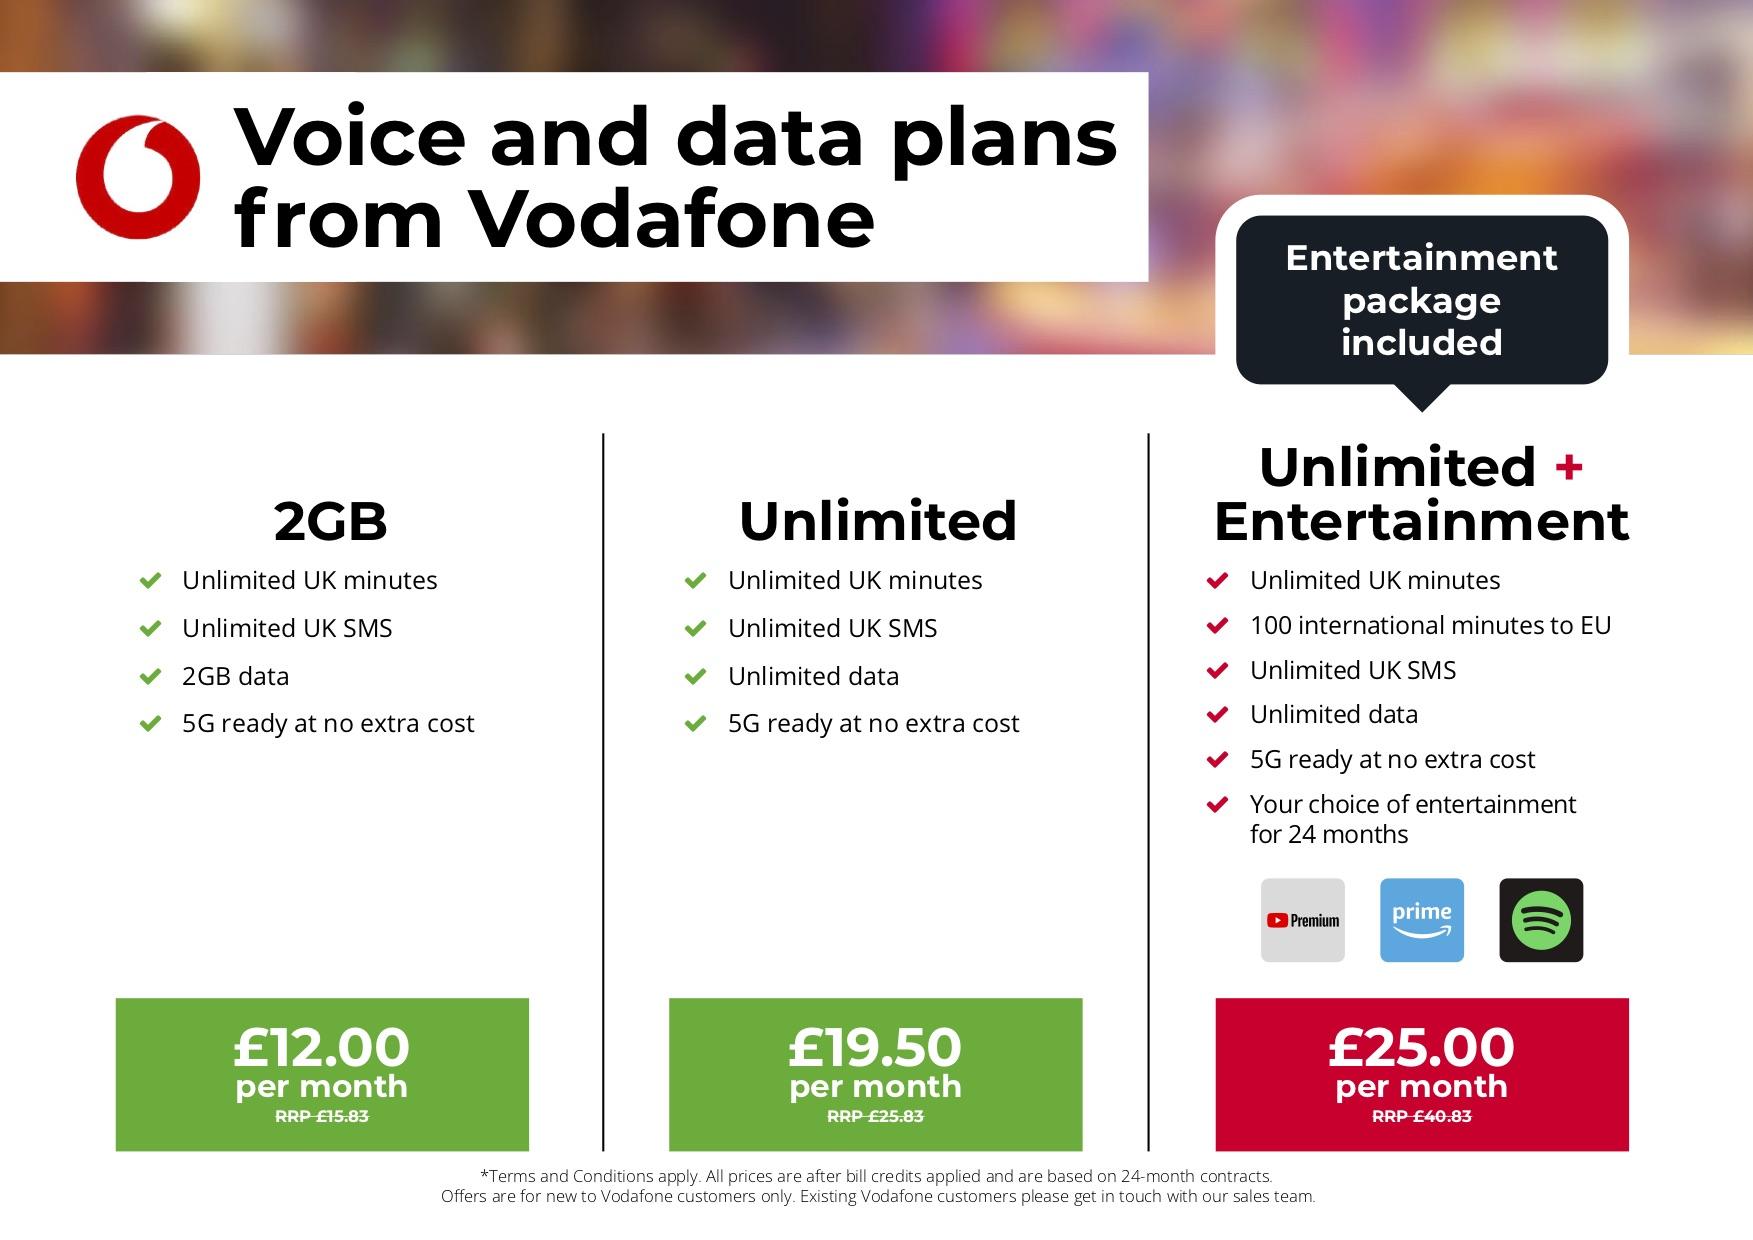 Mobile - £25 per month Unlimited plus entertainment